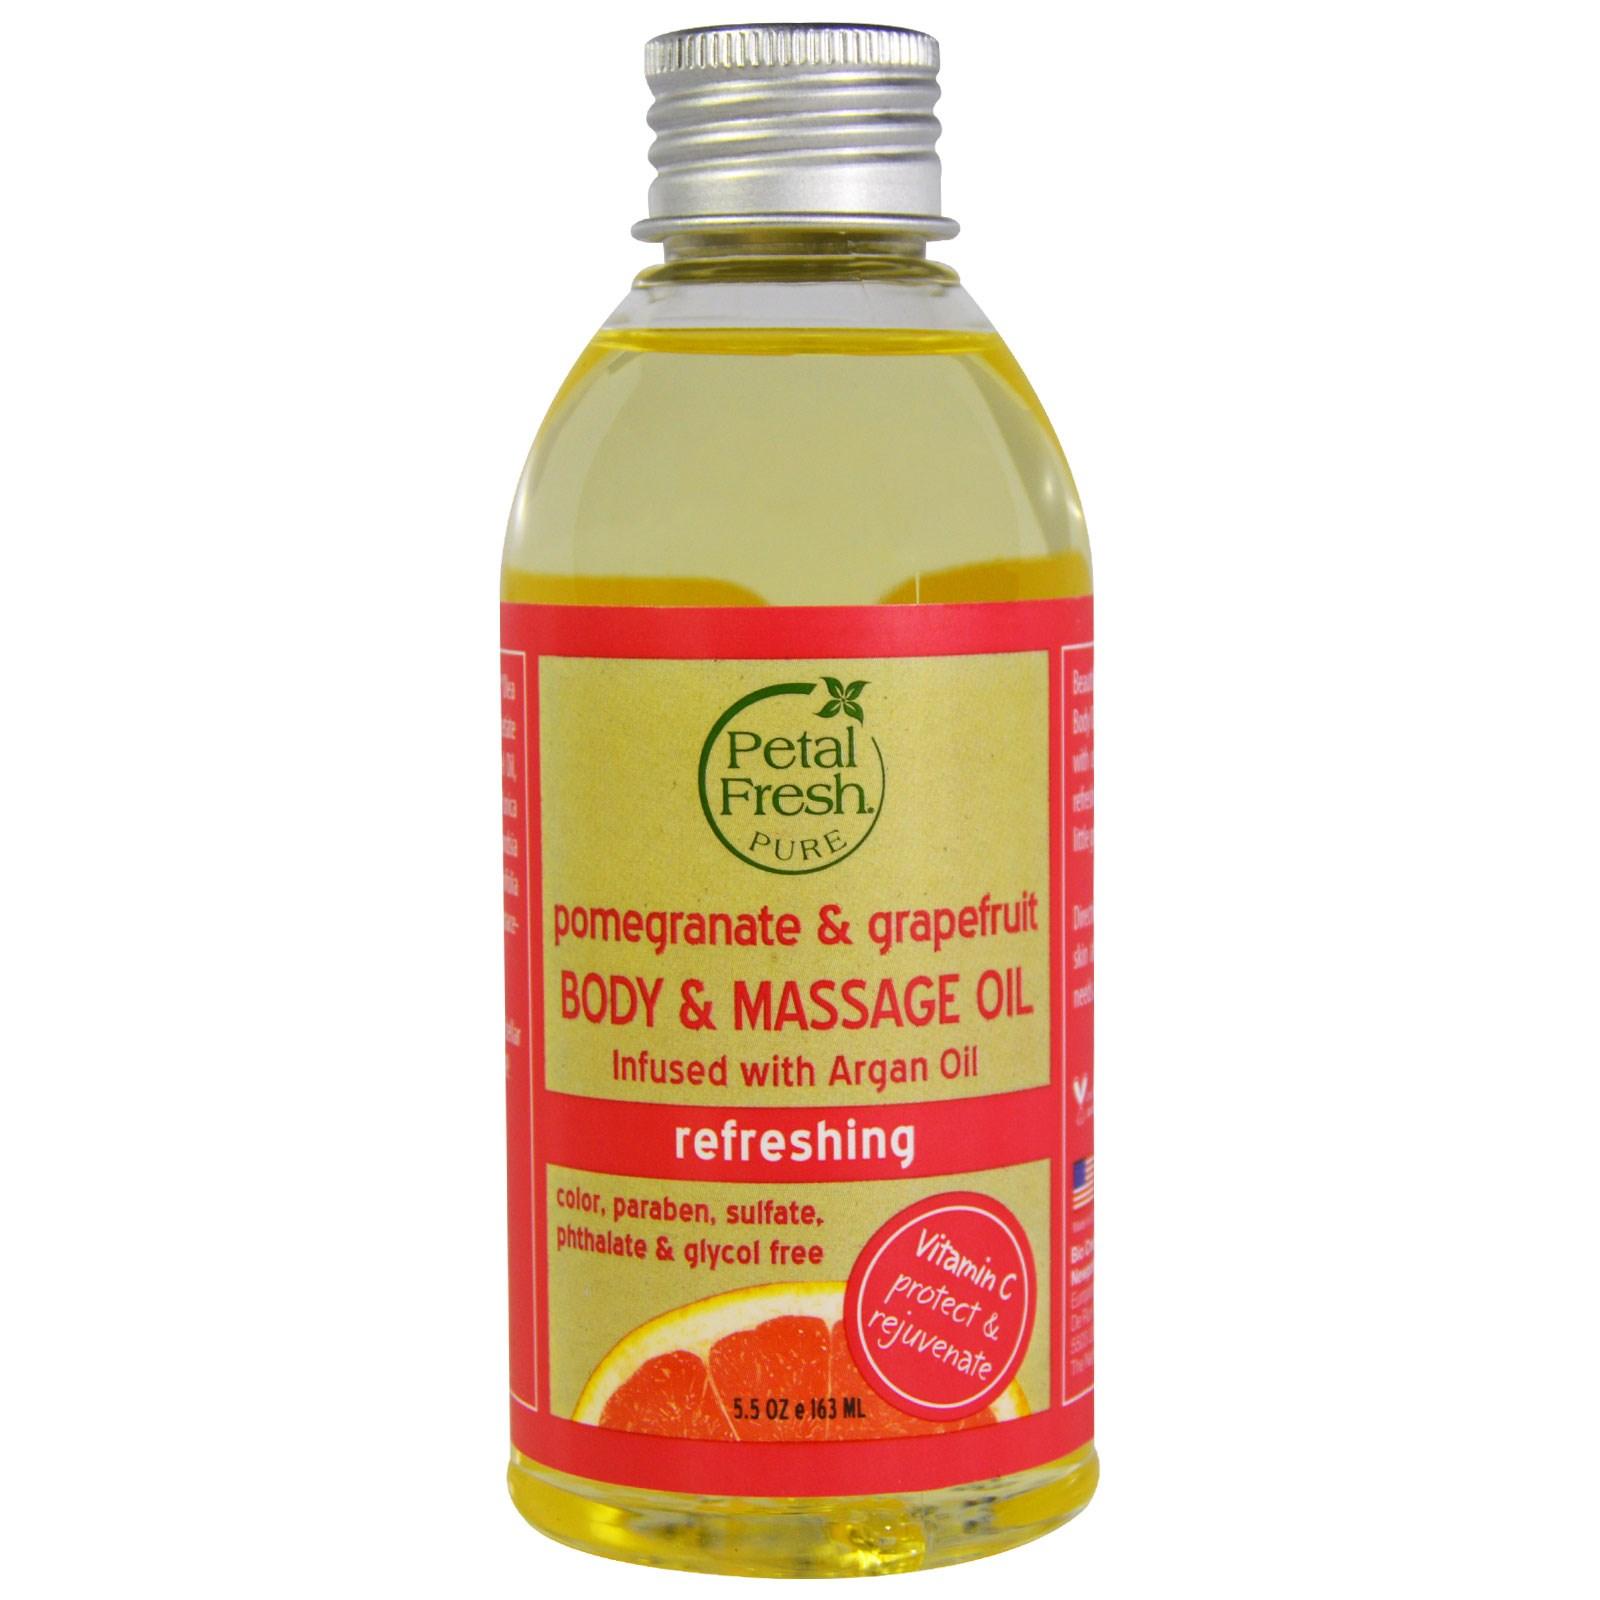 Petal Fresh, Pure, Pomegranate & Grapefruit Body Oil, 5.5 oz